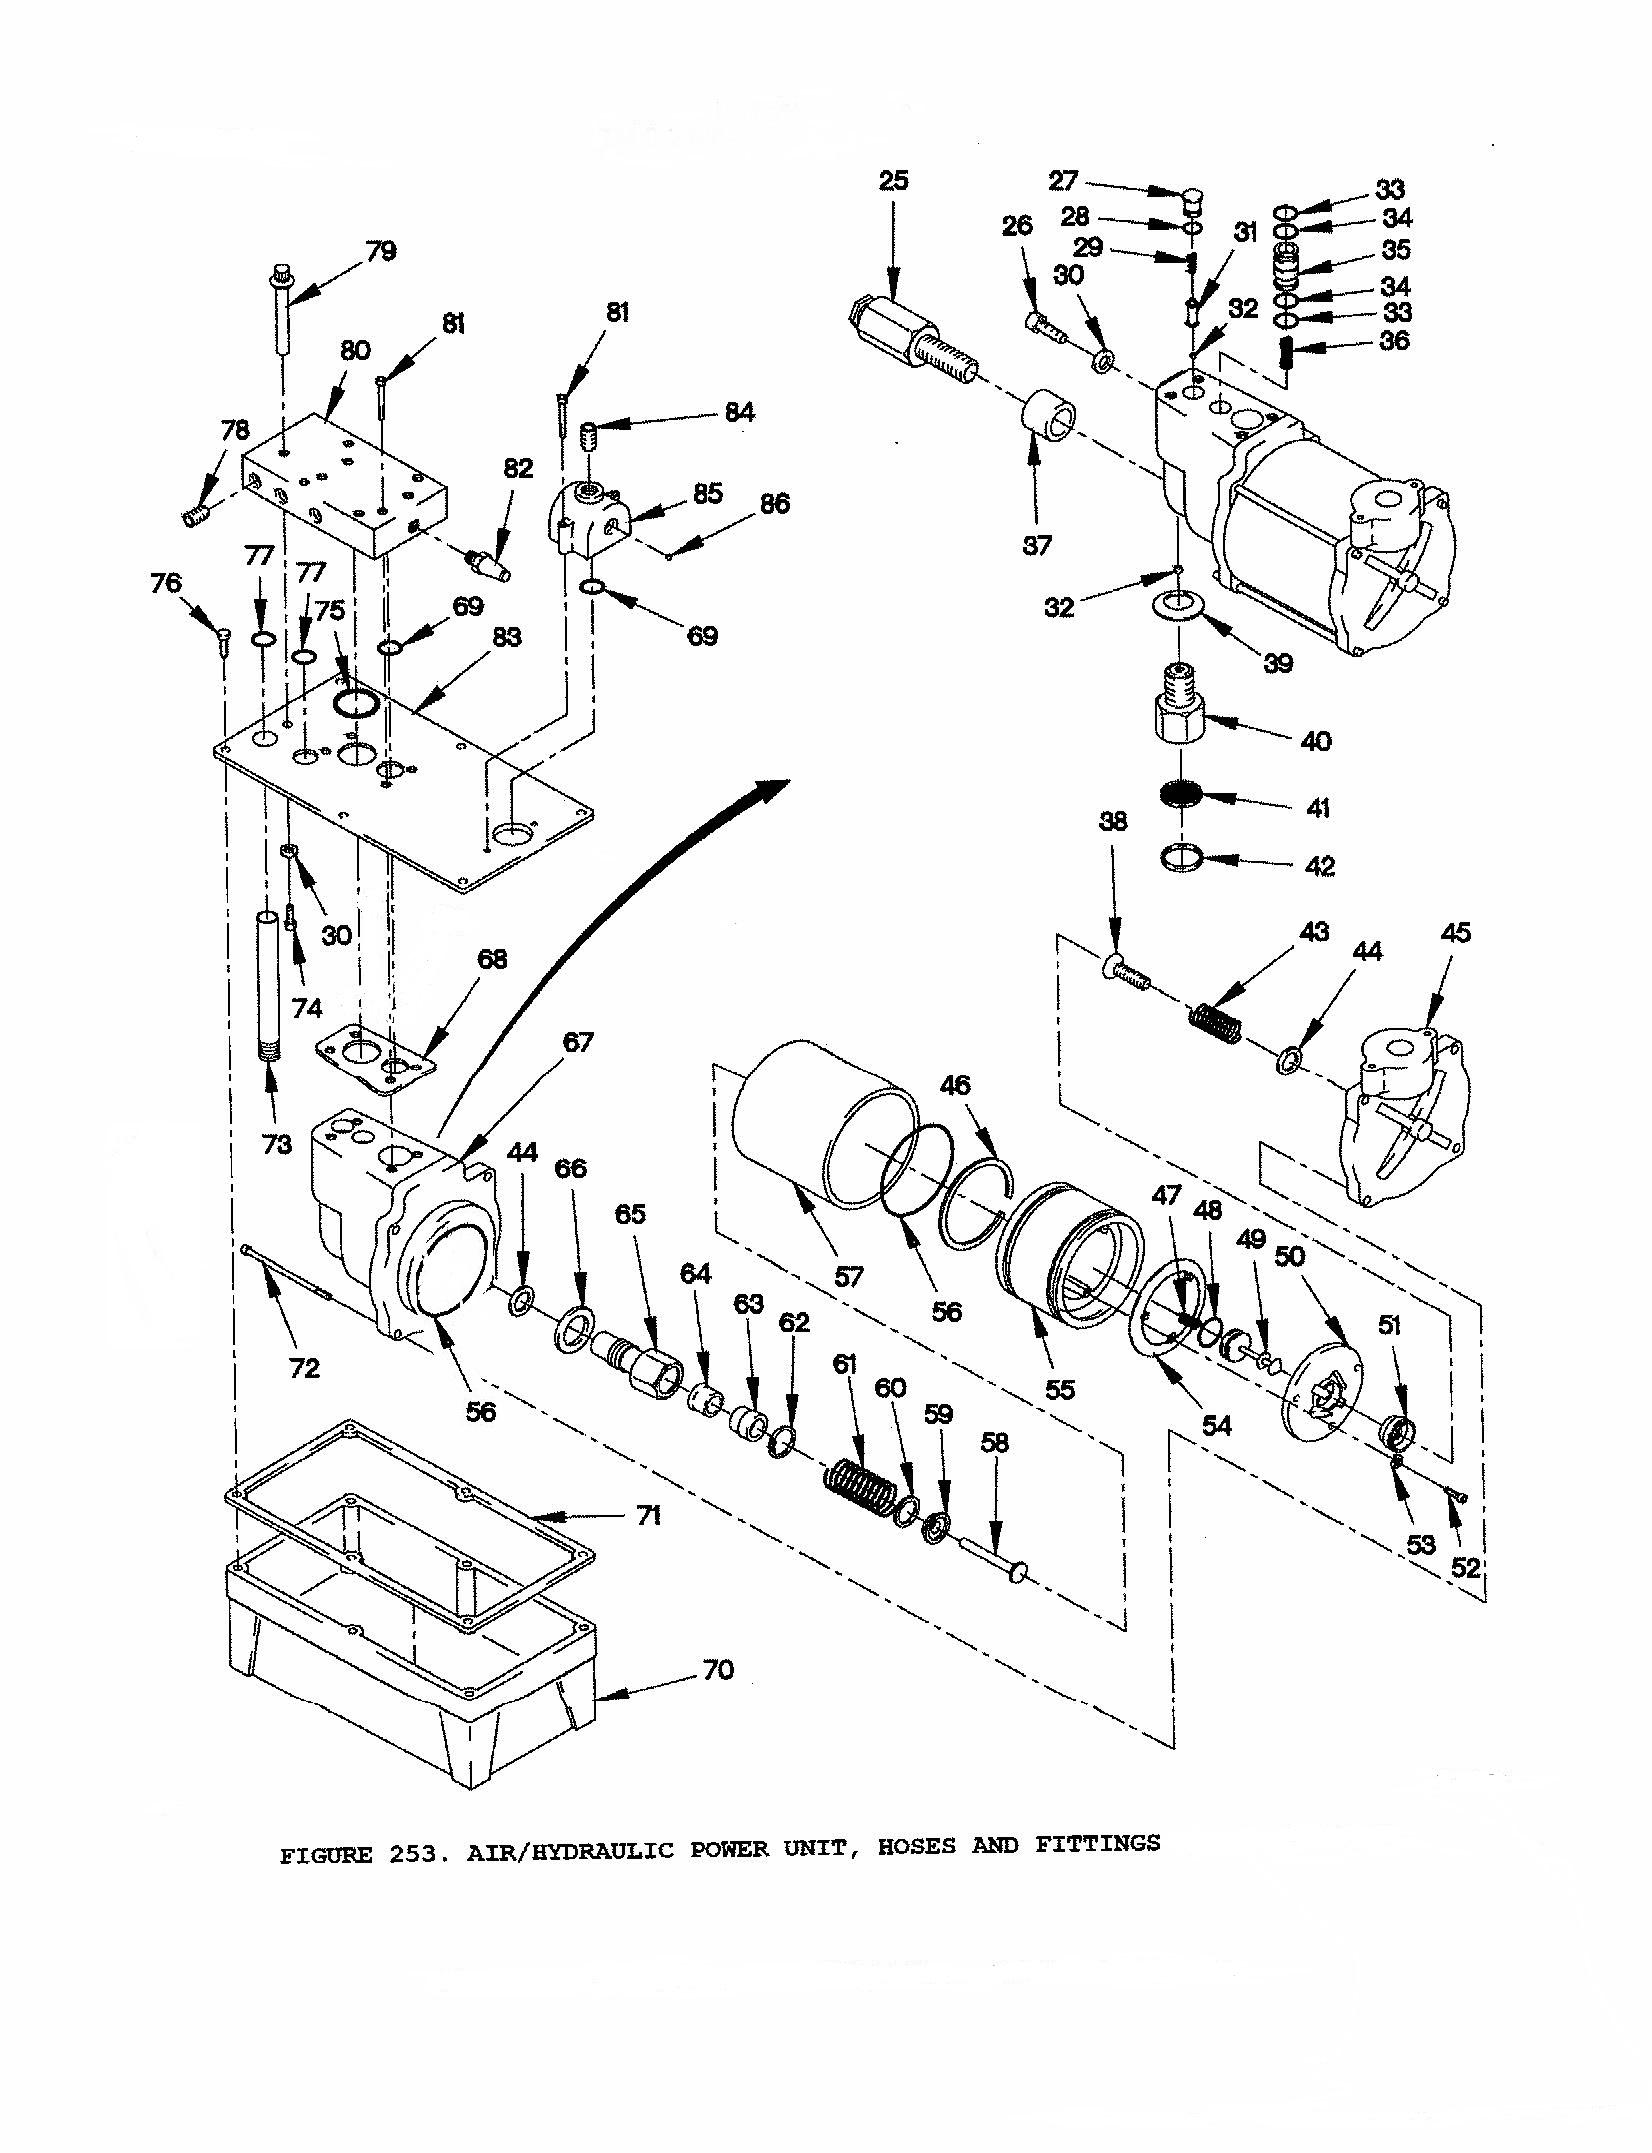 Seal Kit Air Hydraulic Cab Pump Fmtv Lmtv